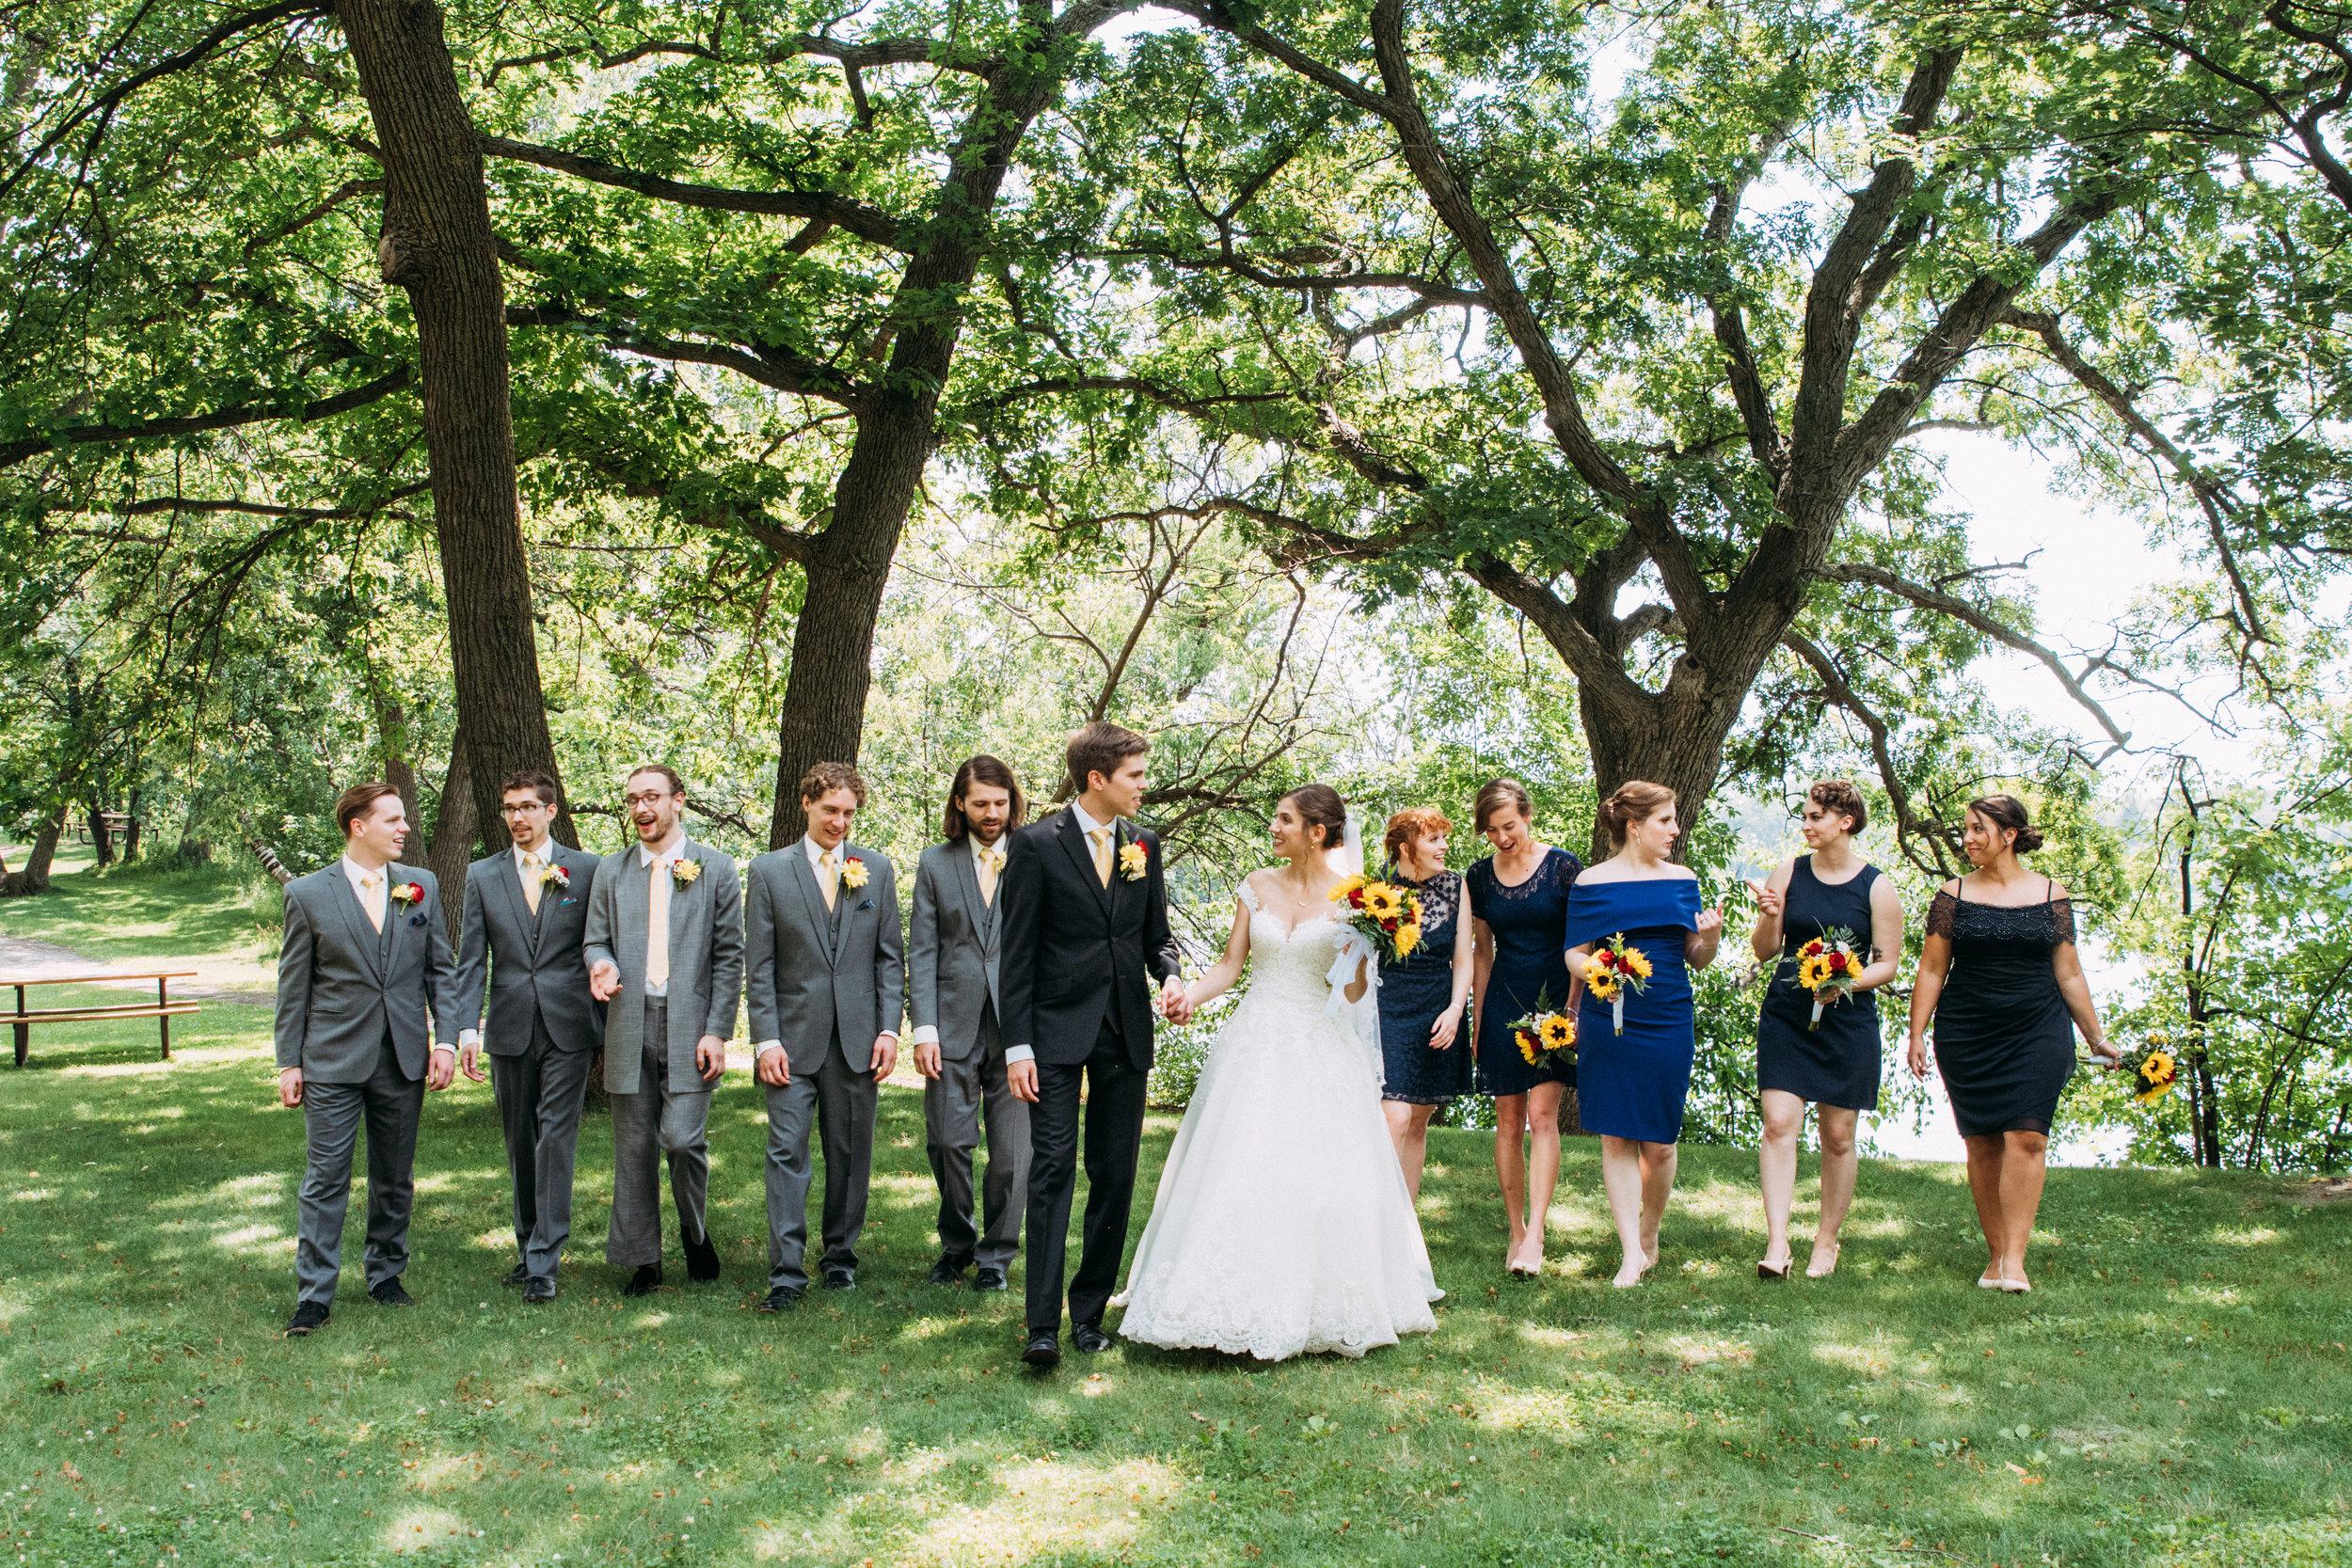 15-Liza_Chris_Minneapolis_Minnesota_Wedding.jpg